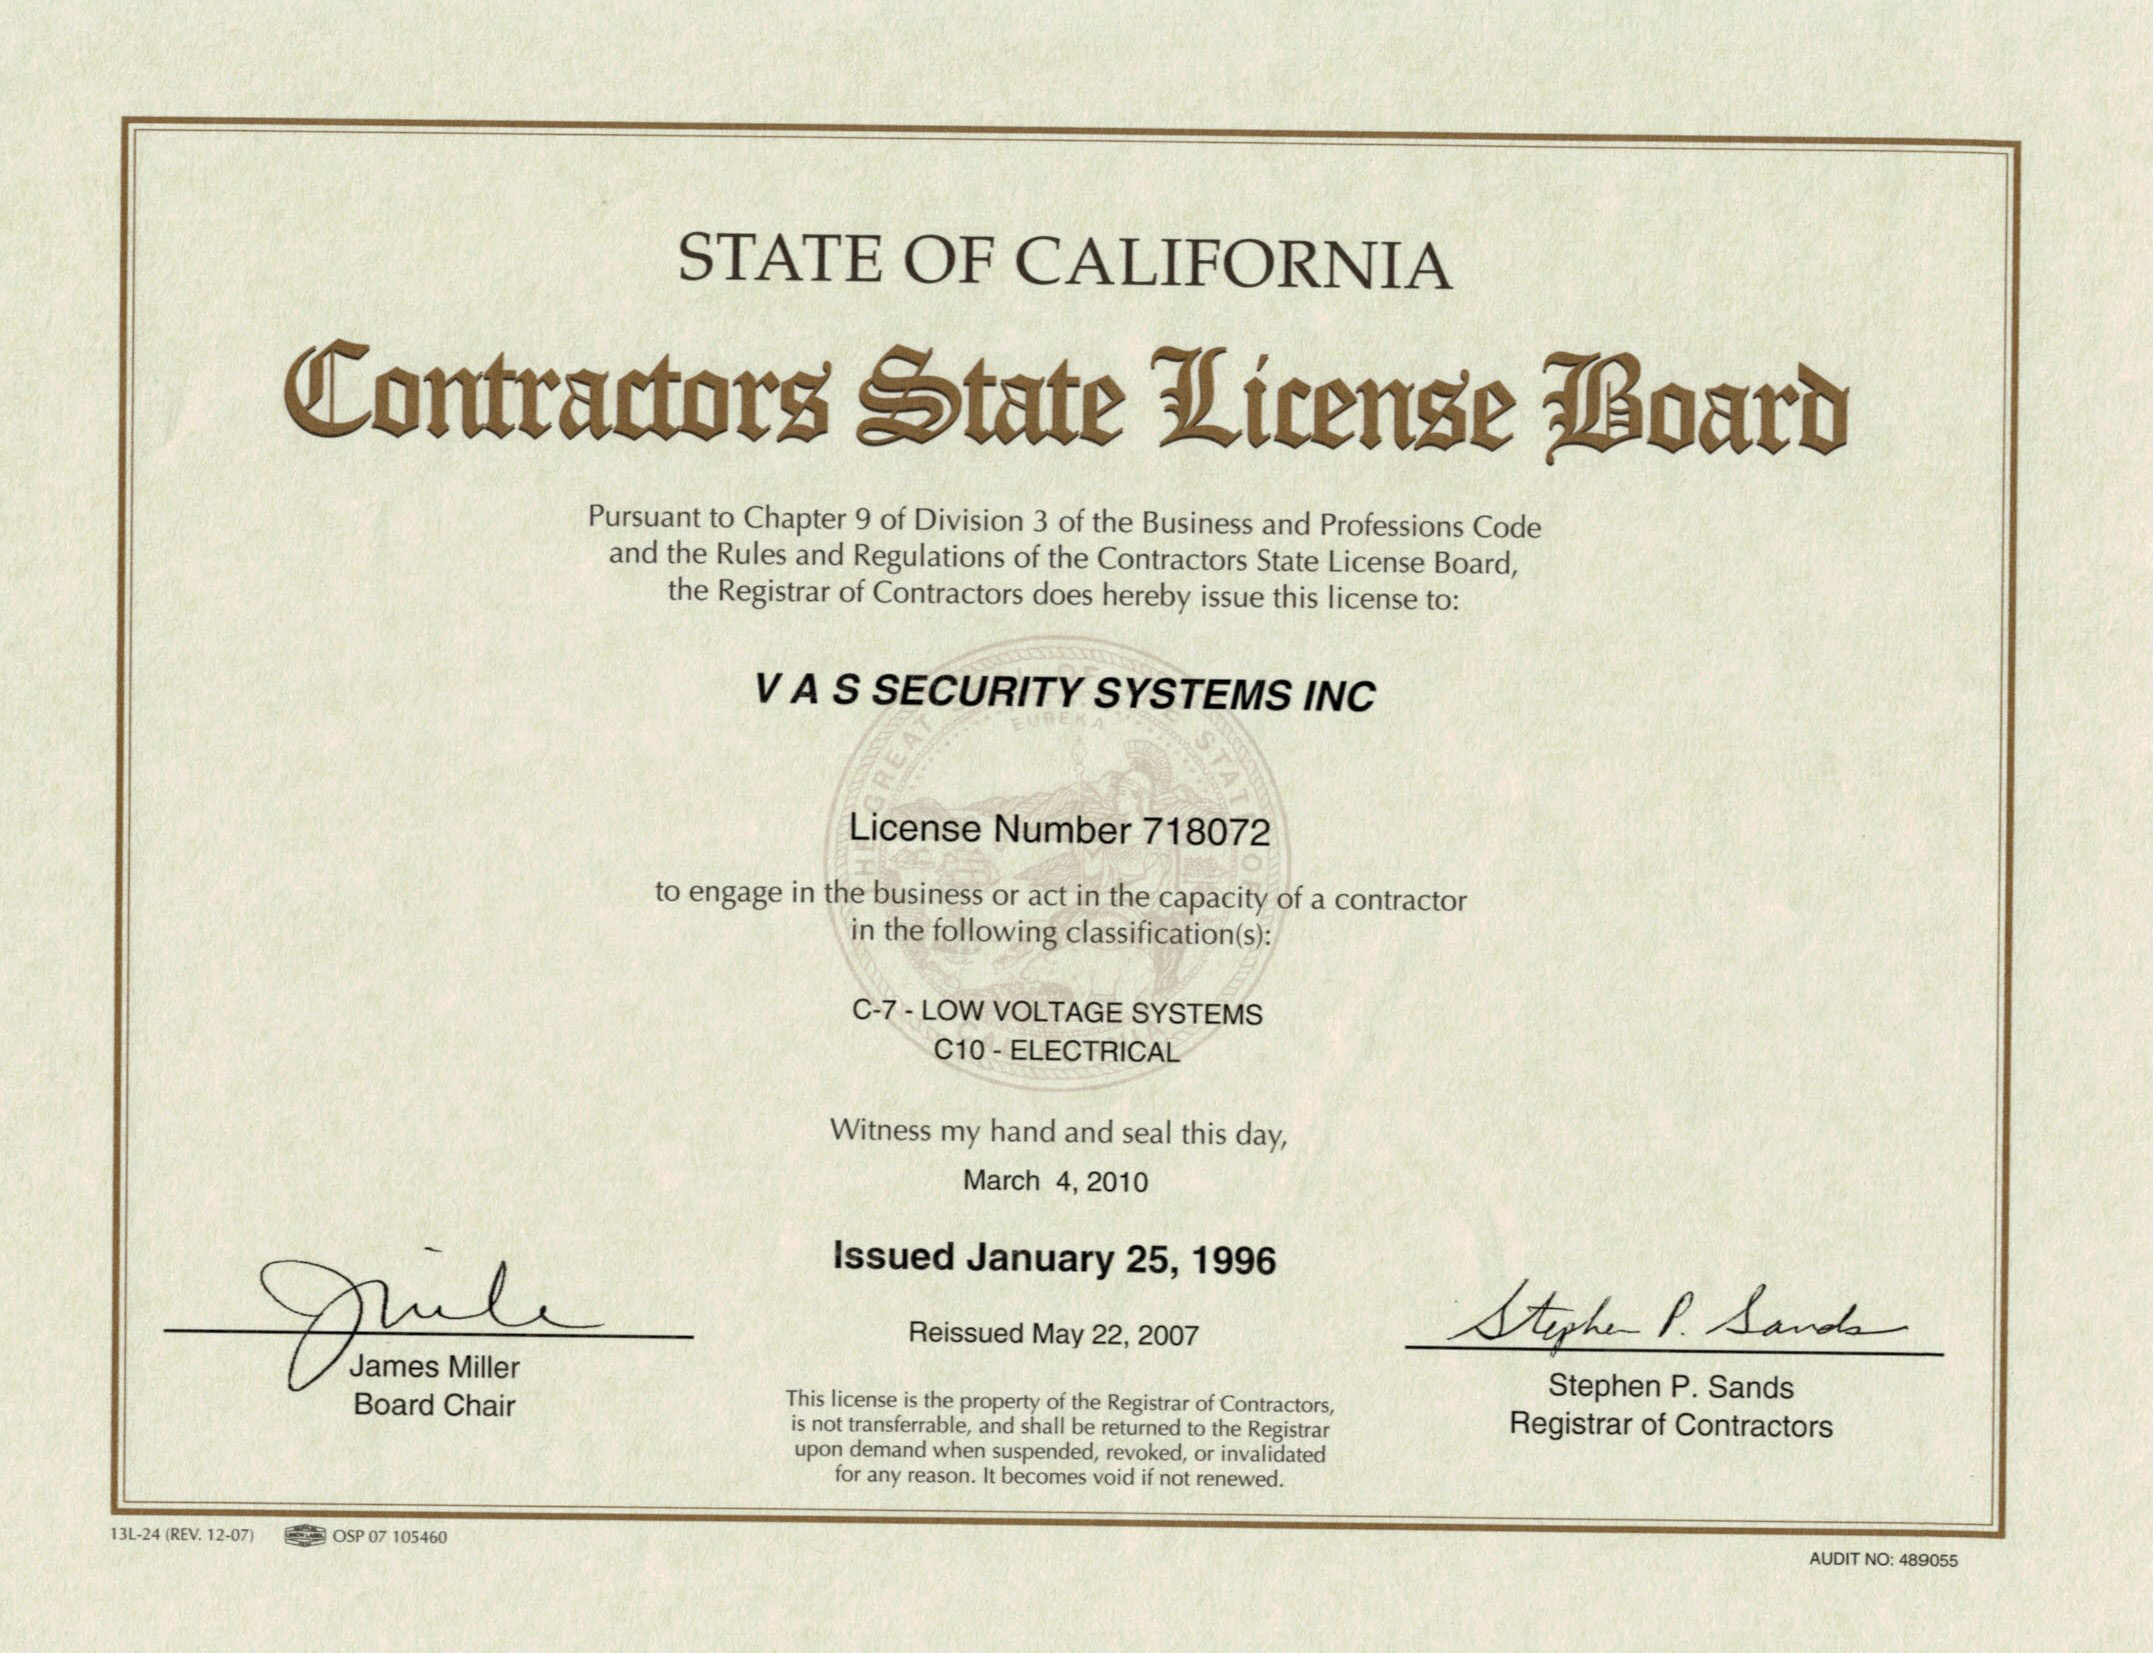 Edgeworth Security Llc Dba Vas Security Systems Inc Licenses